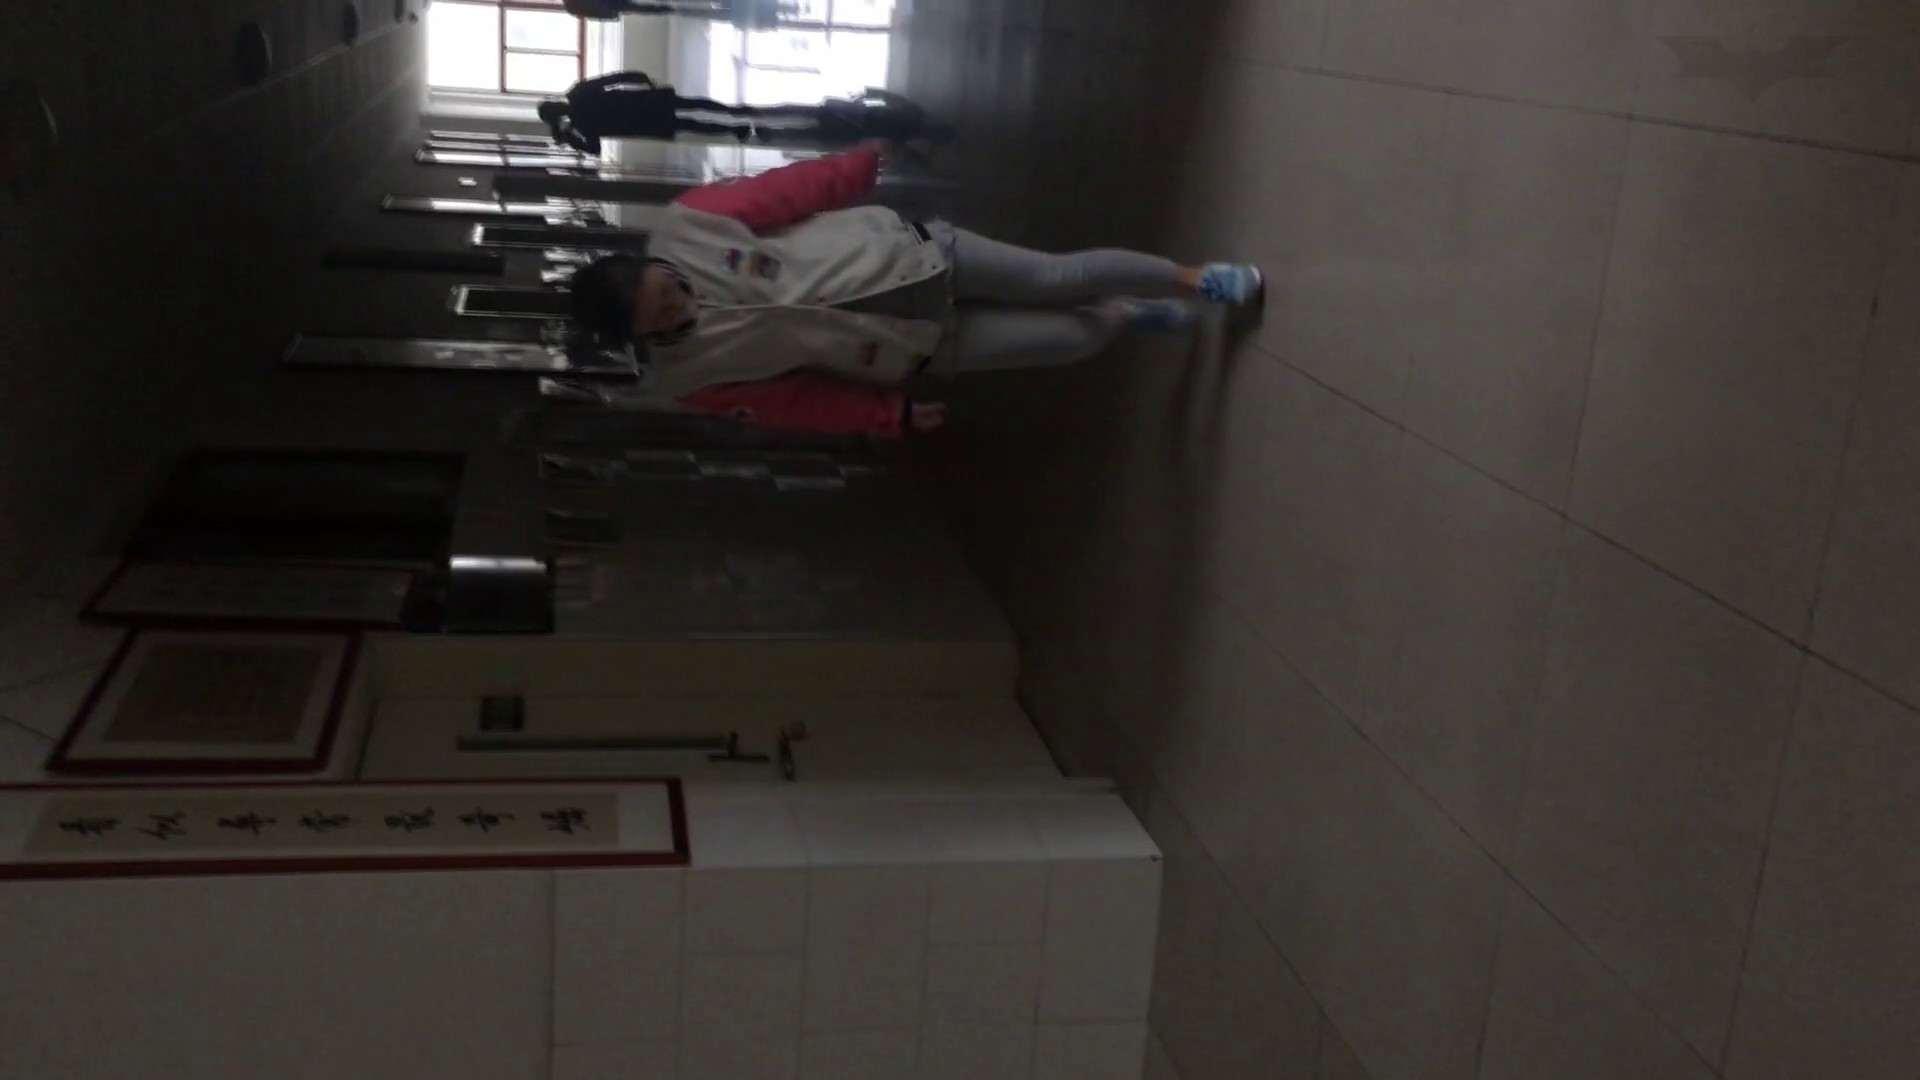 芸術大学ガチ潜入盗撮 JD盗撮 美女の洗面所の秘密 Vol.80 高評価 ワレメ動画紹介 69画像 57